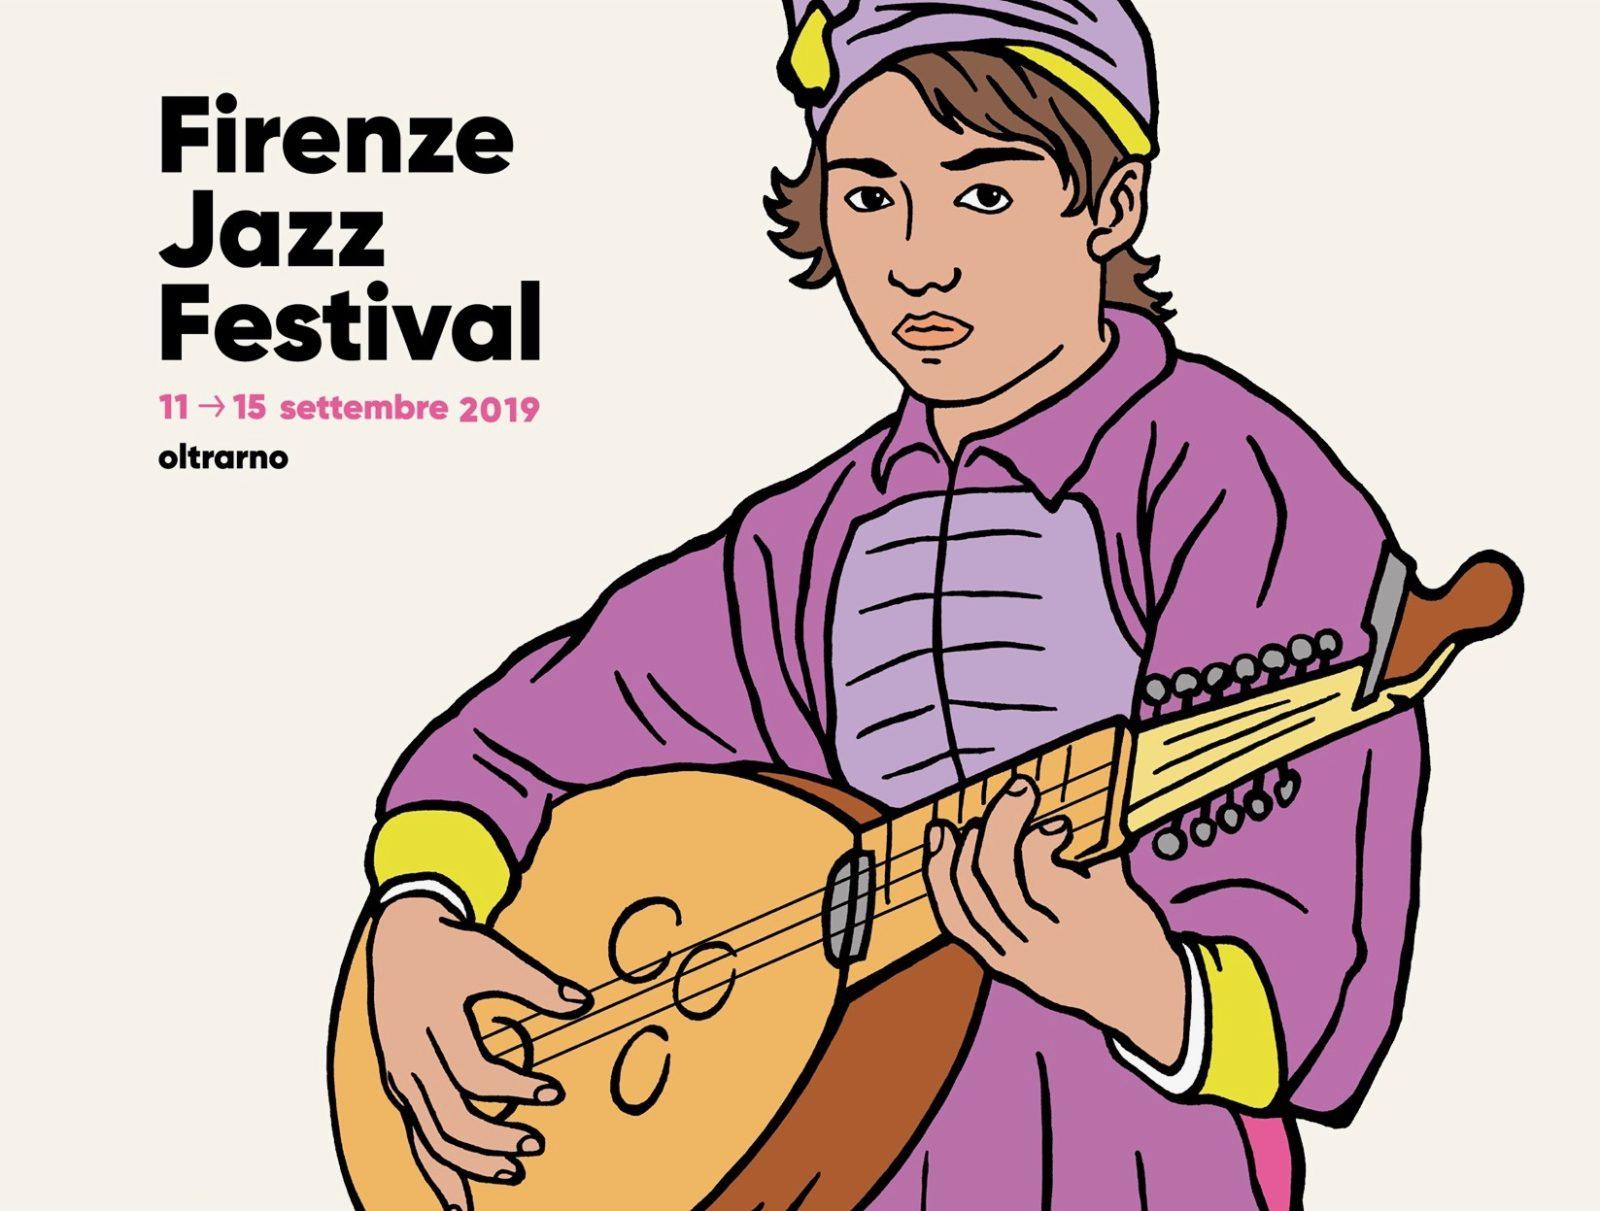 firenze jazz festival 2019